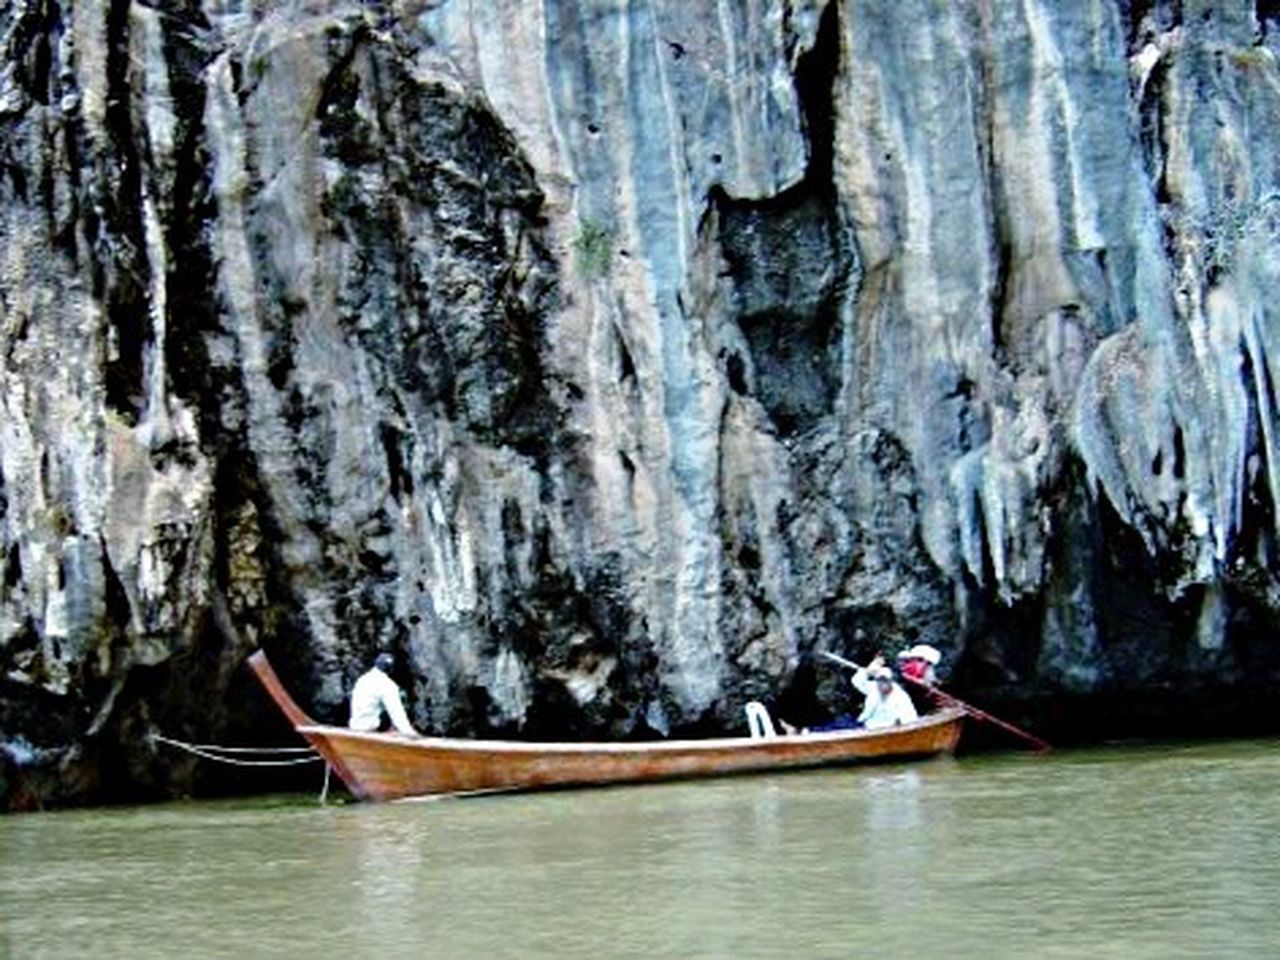 Thai fisherman off of a limestone island. Thai Fish Boat Limestonephotos Travel Photography Wood Boat Taking Photos Thailand